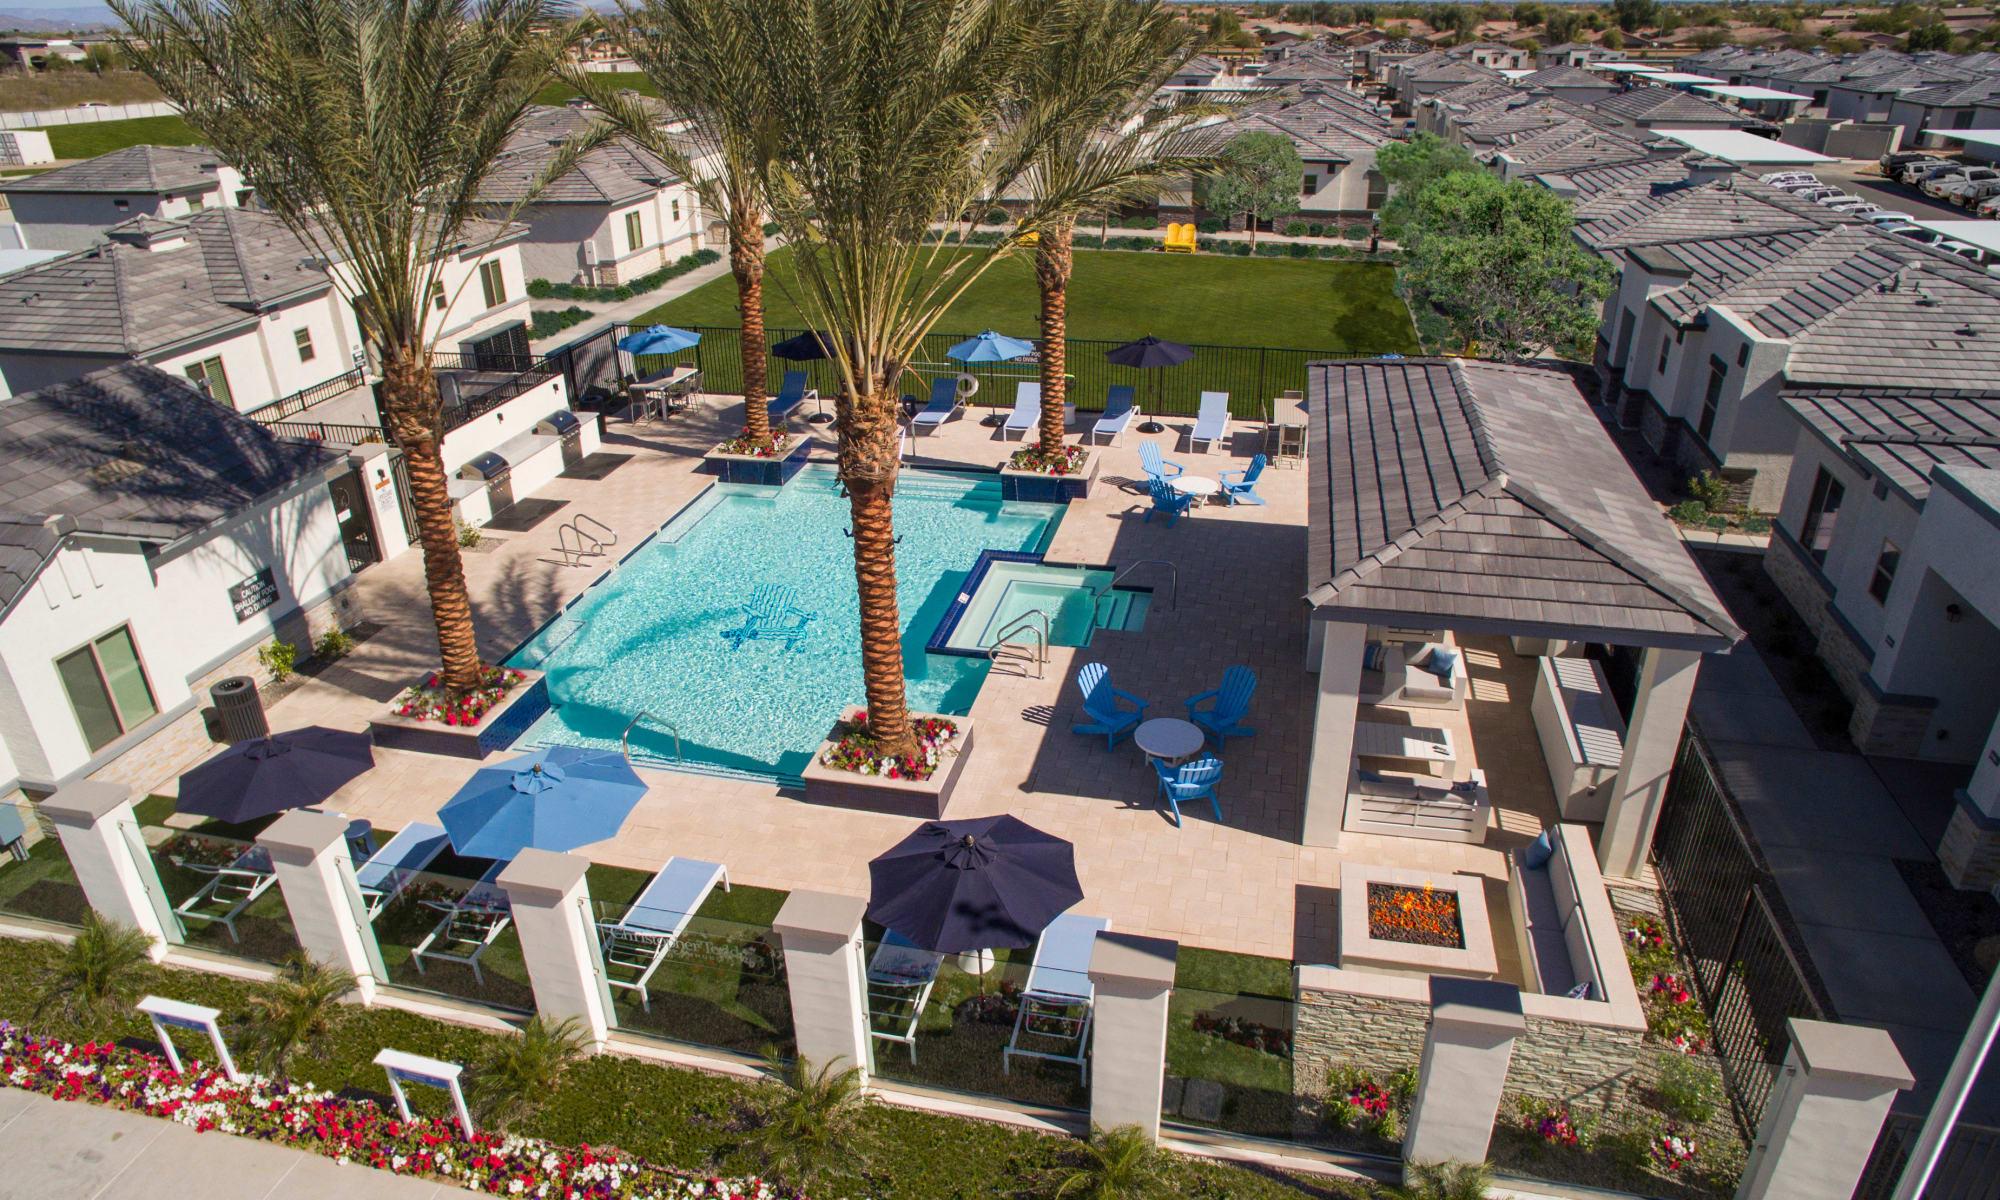 Our beautiful apartments in Peoria, Arizona